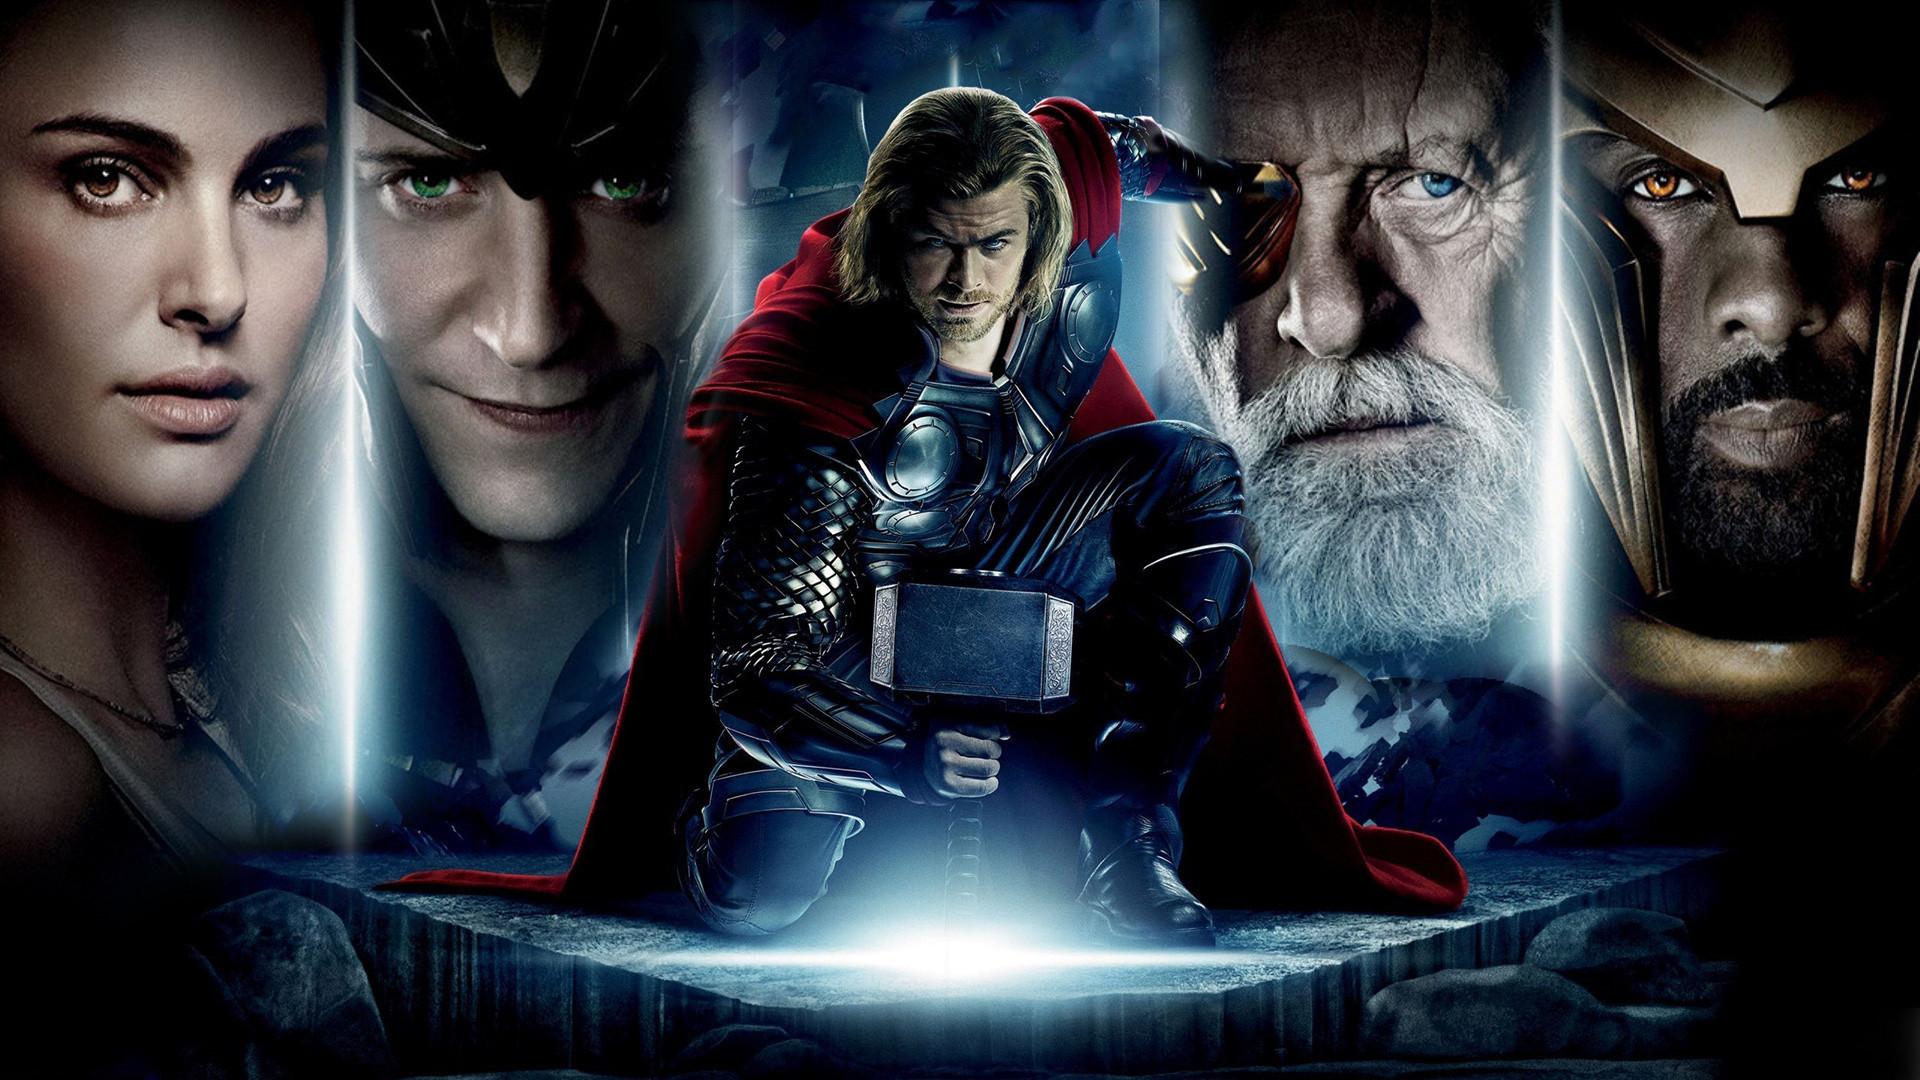 Res: 1920x1080, Thor Movie 2011